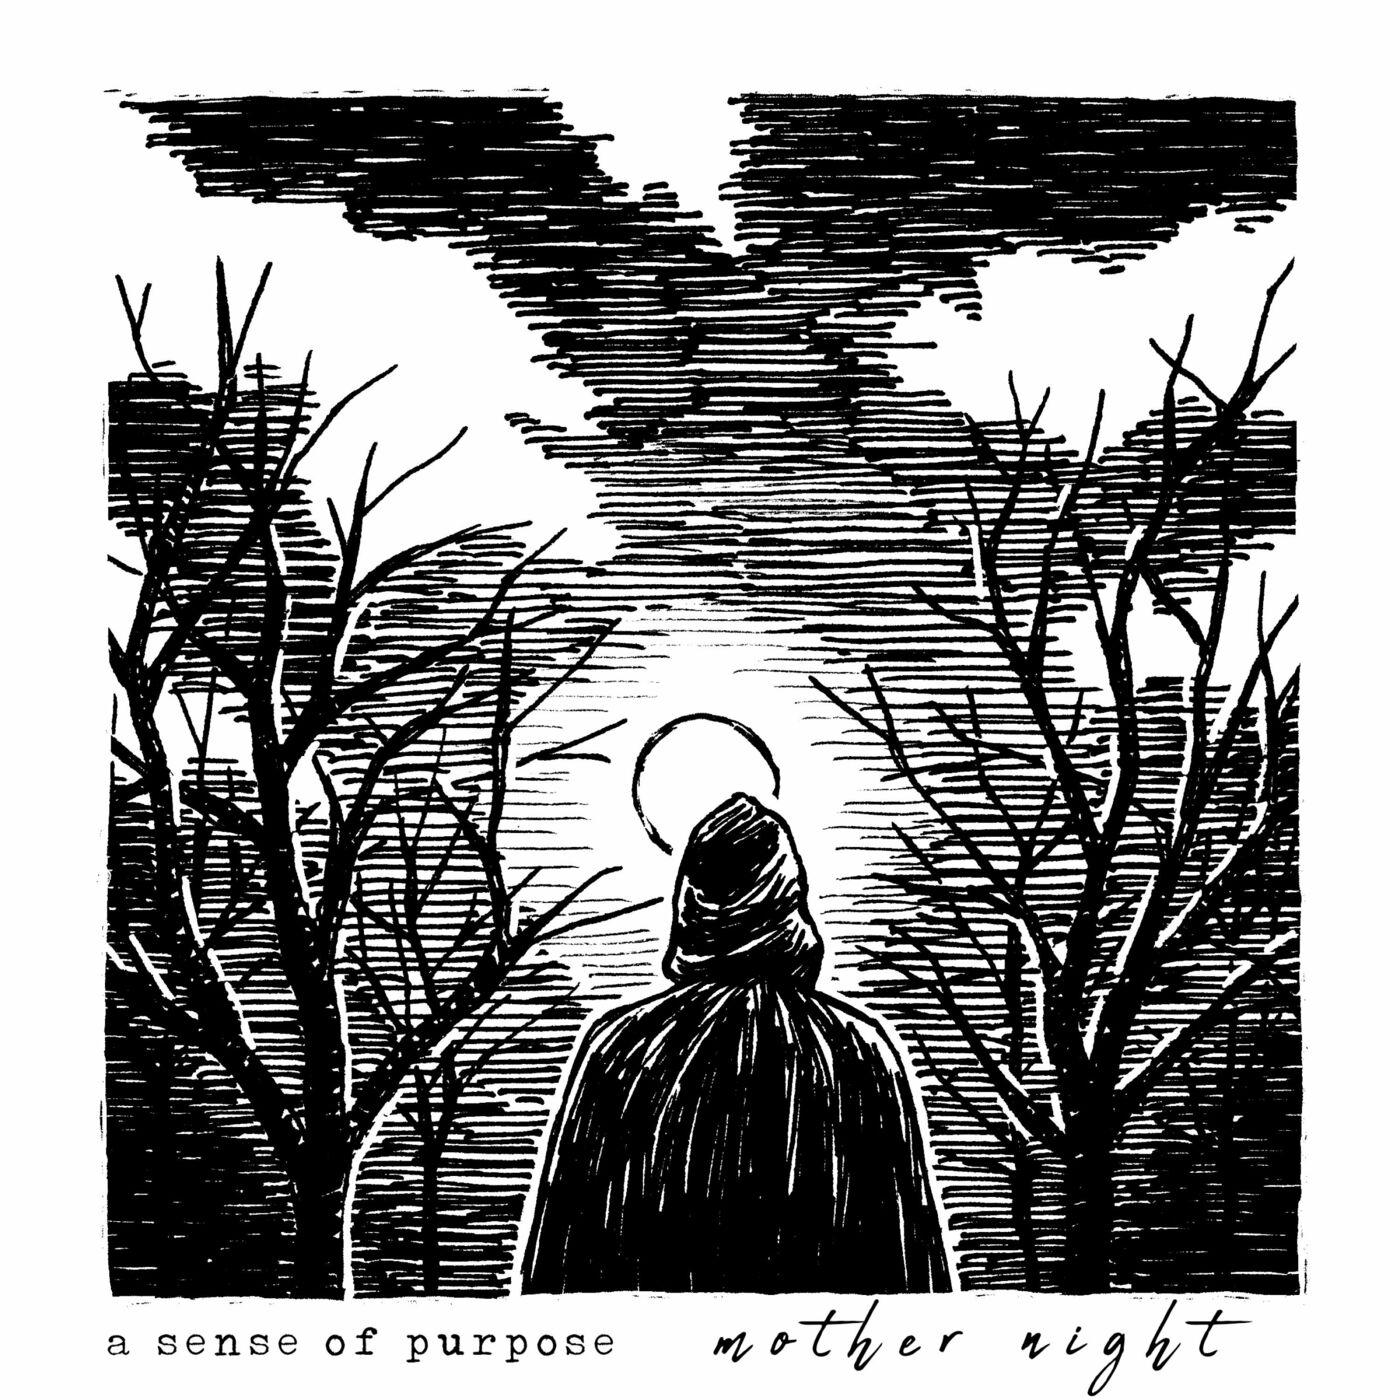 A Sense of Purpose - Mother Night [single] (2020)